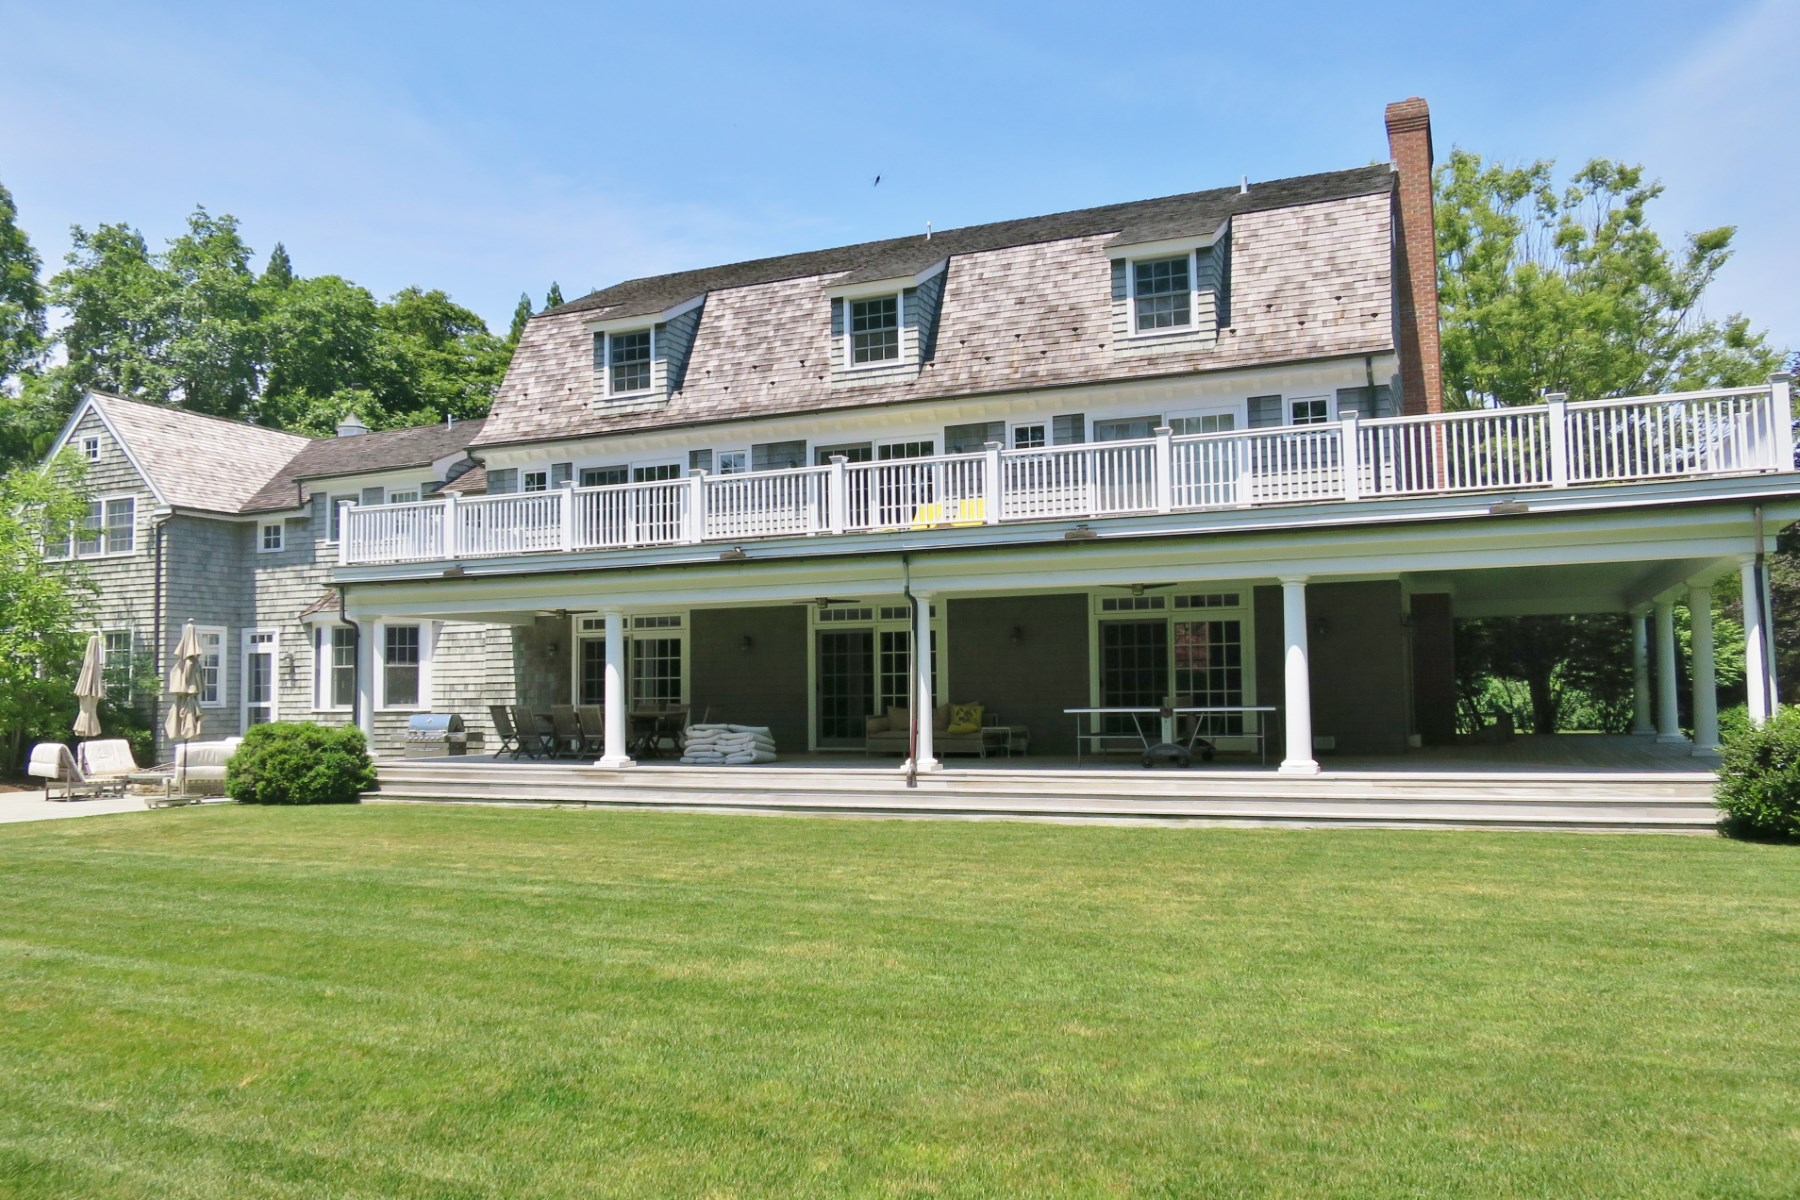 Single Family Home for Rent at Georgica Estate 24 Jericho Close East Hampton, New York 11937 United States